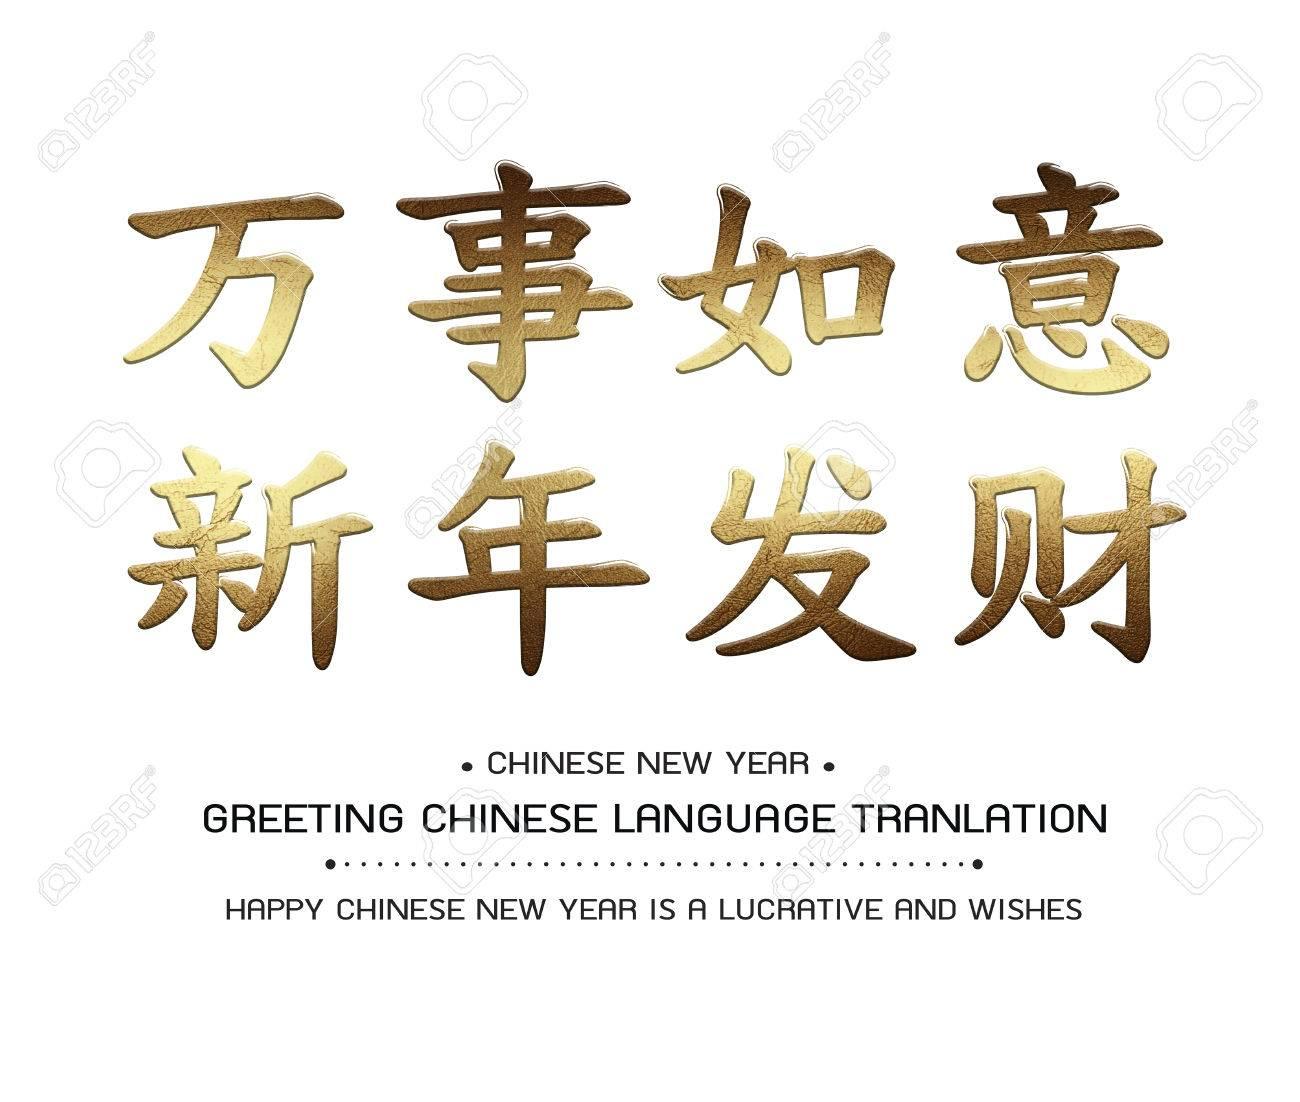 Greeting chinese language tranlation happy chinese new year wish greeting chinese language tranlation happy chinese new year wish you be rich stock photo 51652571 m4hsunfo